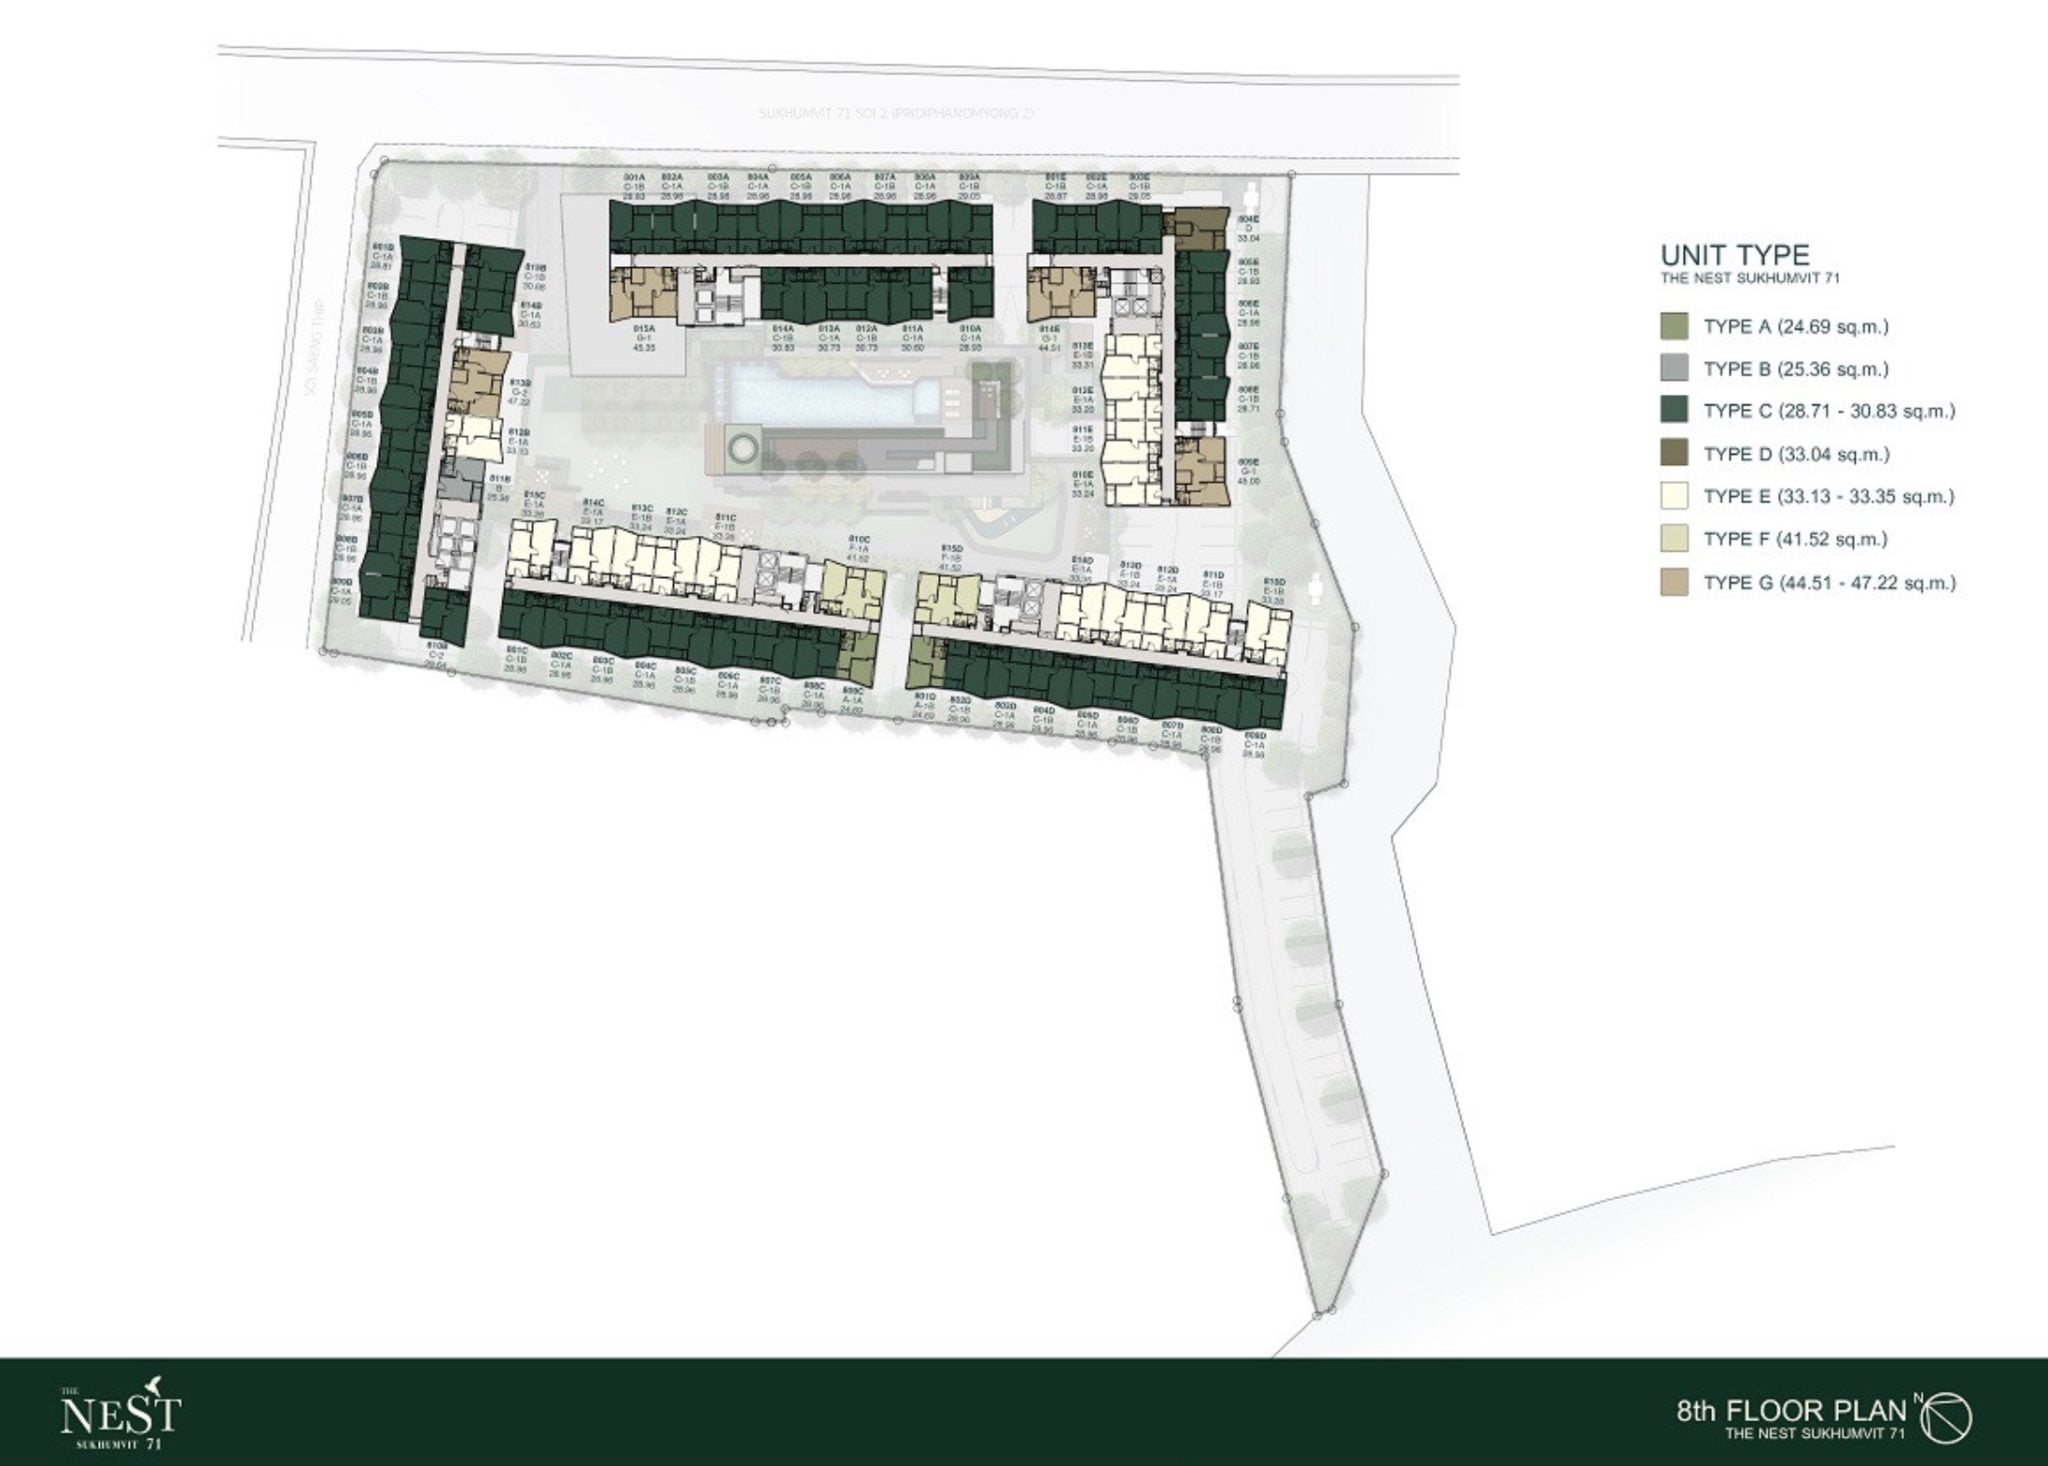 Nest Sukhumvit 71 Bangkok-8th Floor Plan